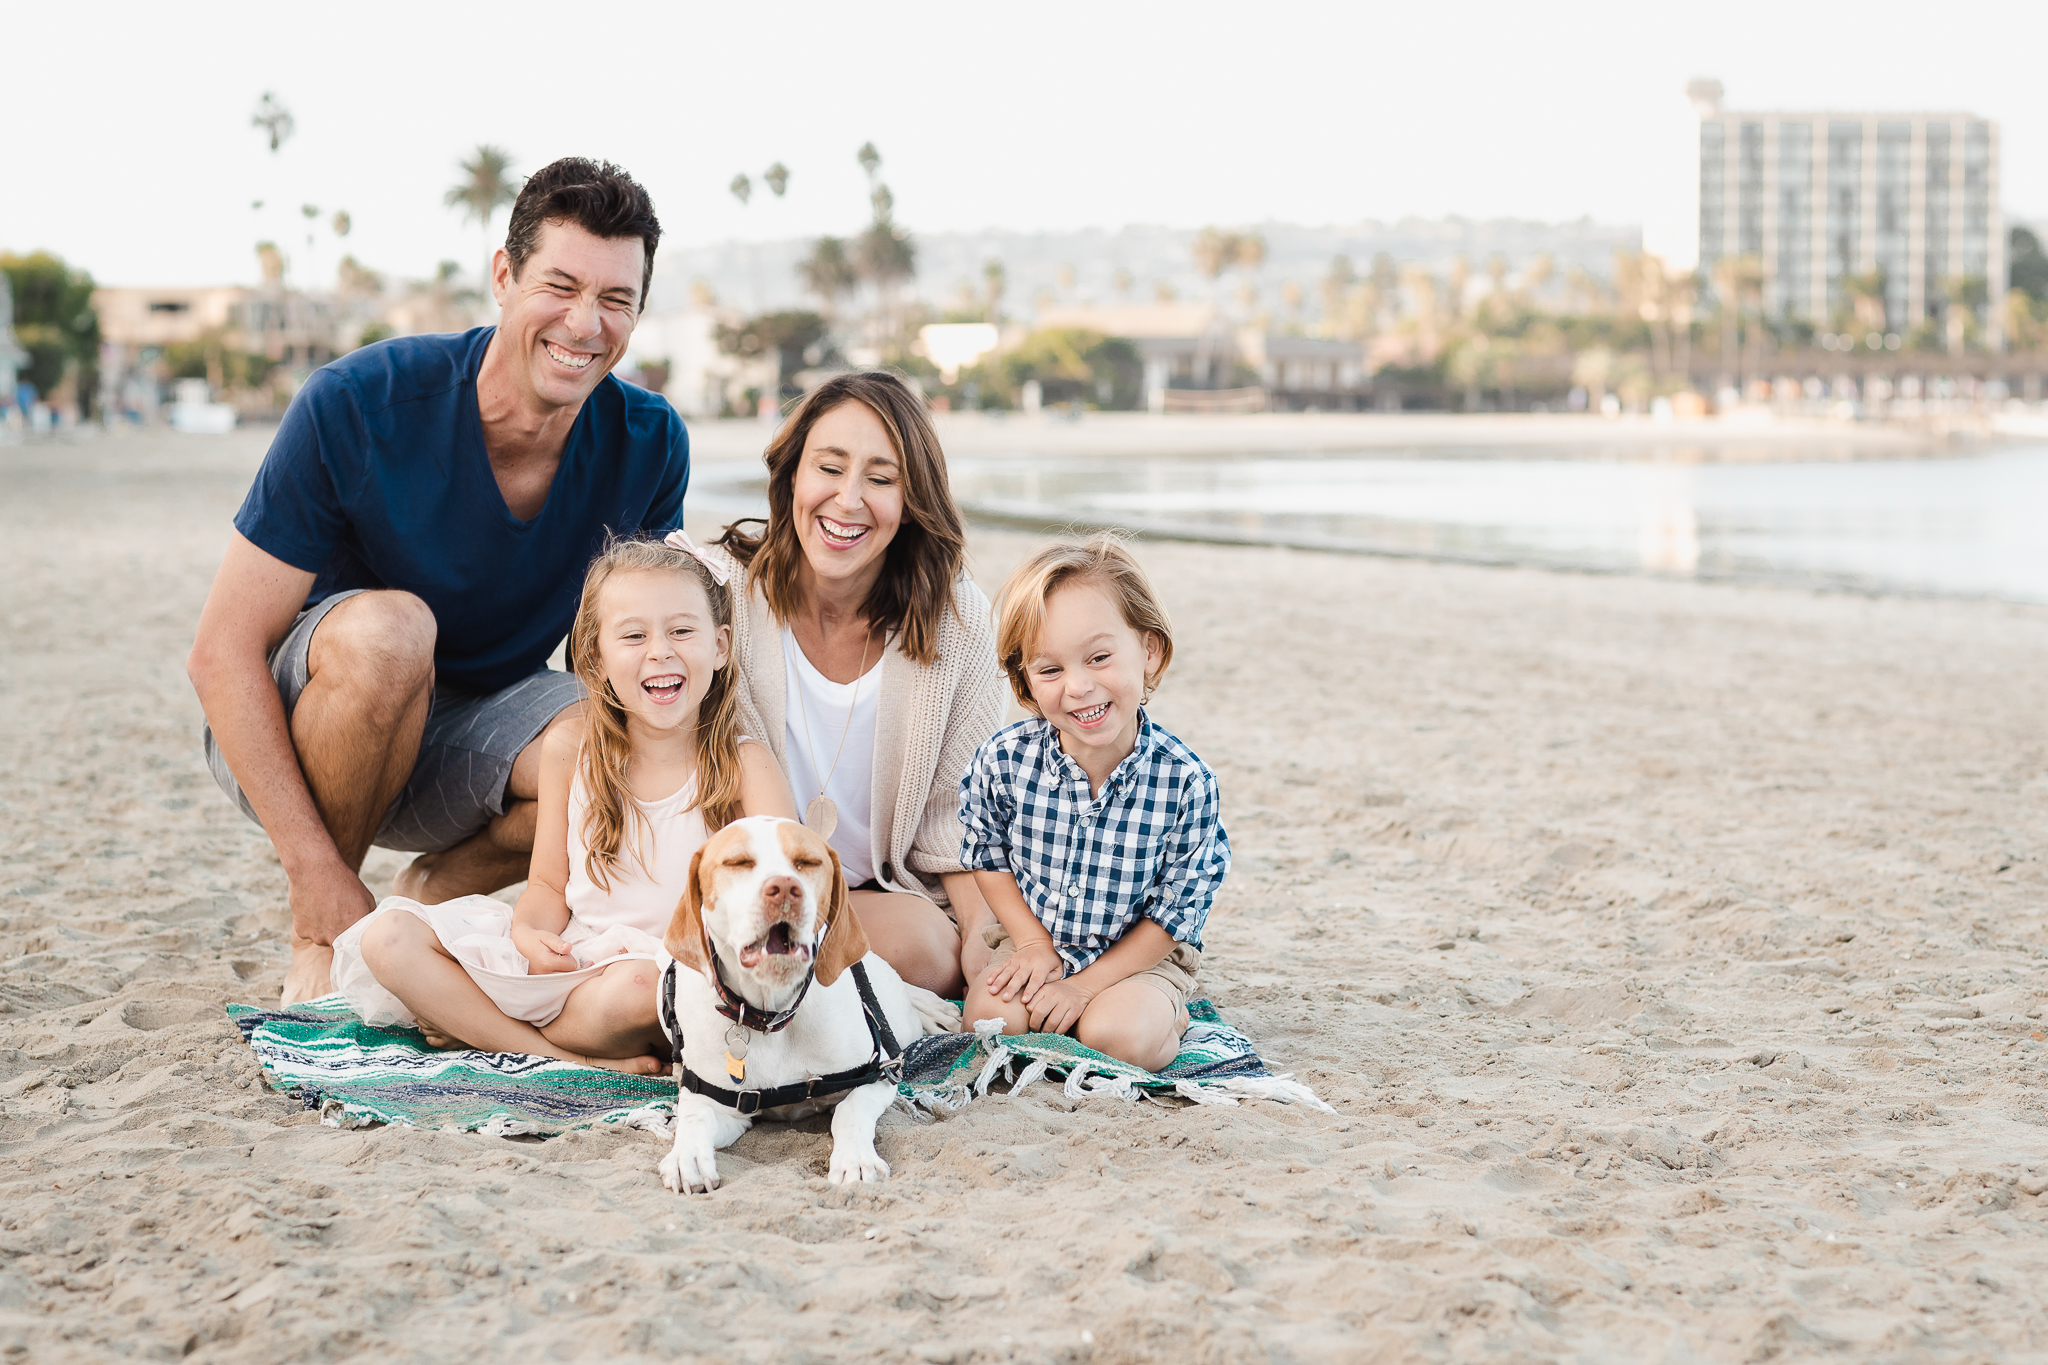 San Diego Vacation photos